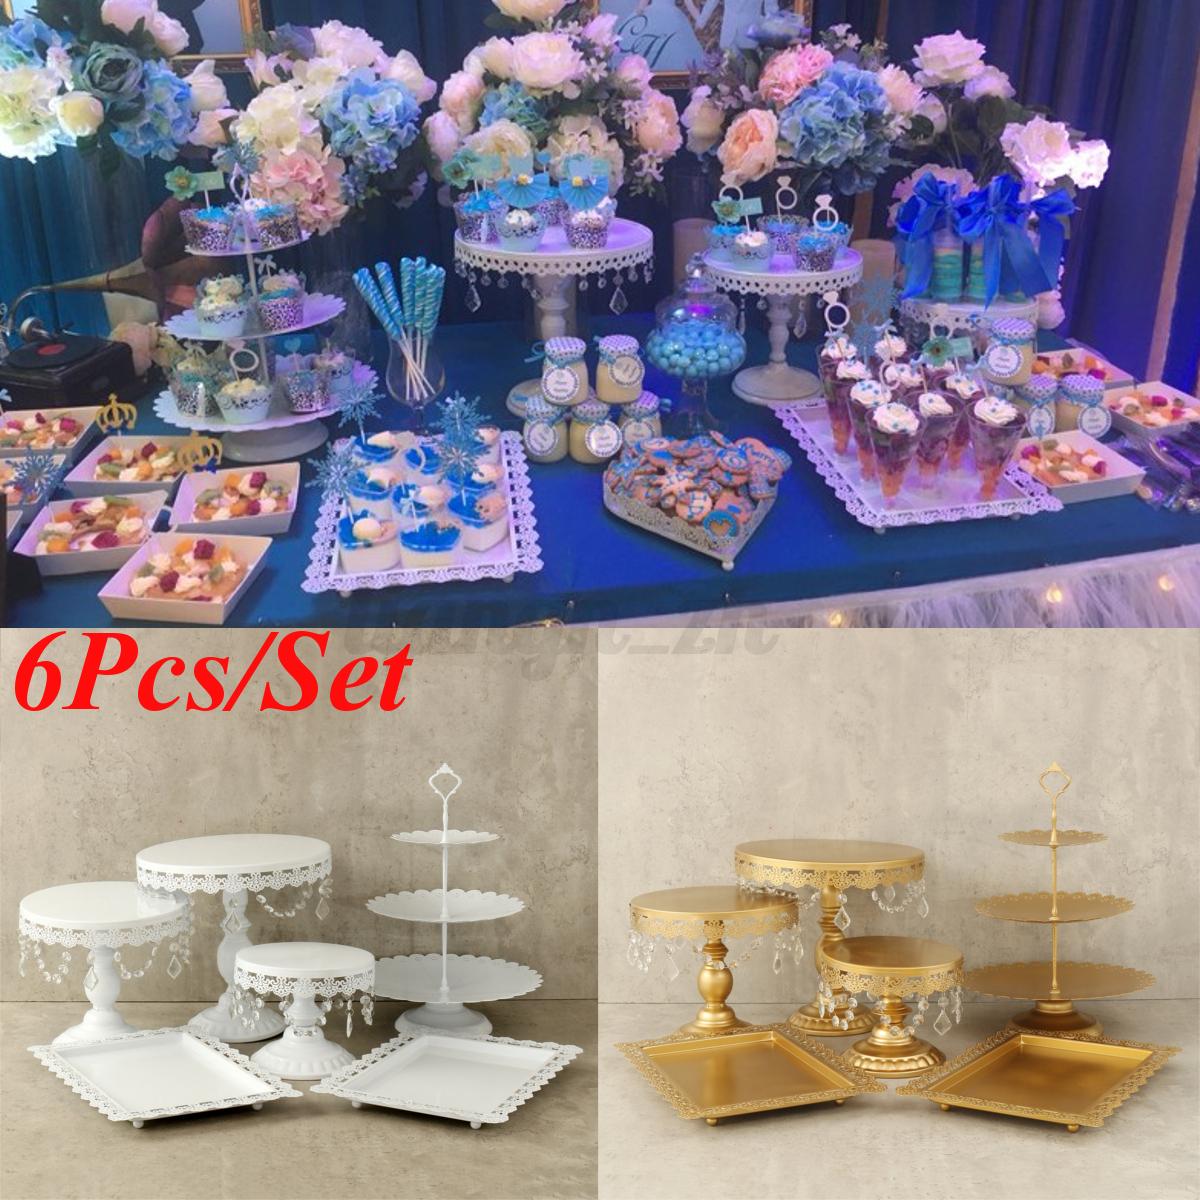 set of 6 pieces white gold crystal cake stand cupcake wedding dessert candy bar ebay. Black Bedroom Furniture Sets. Home Design Ideas